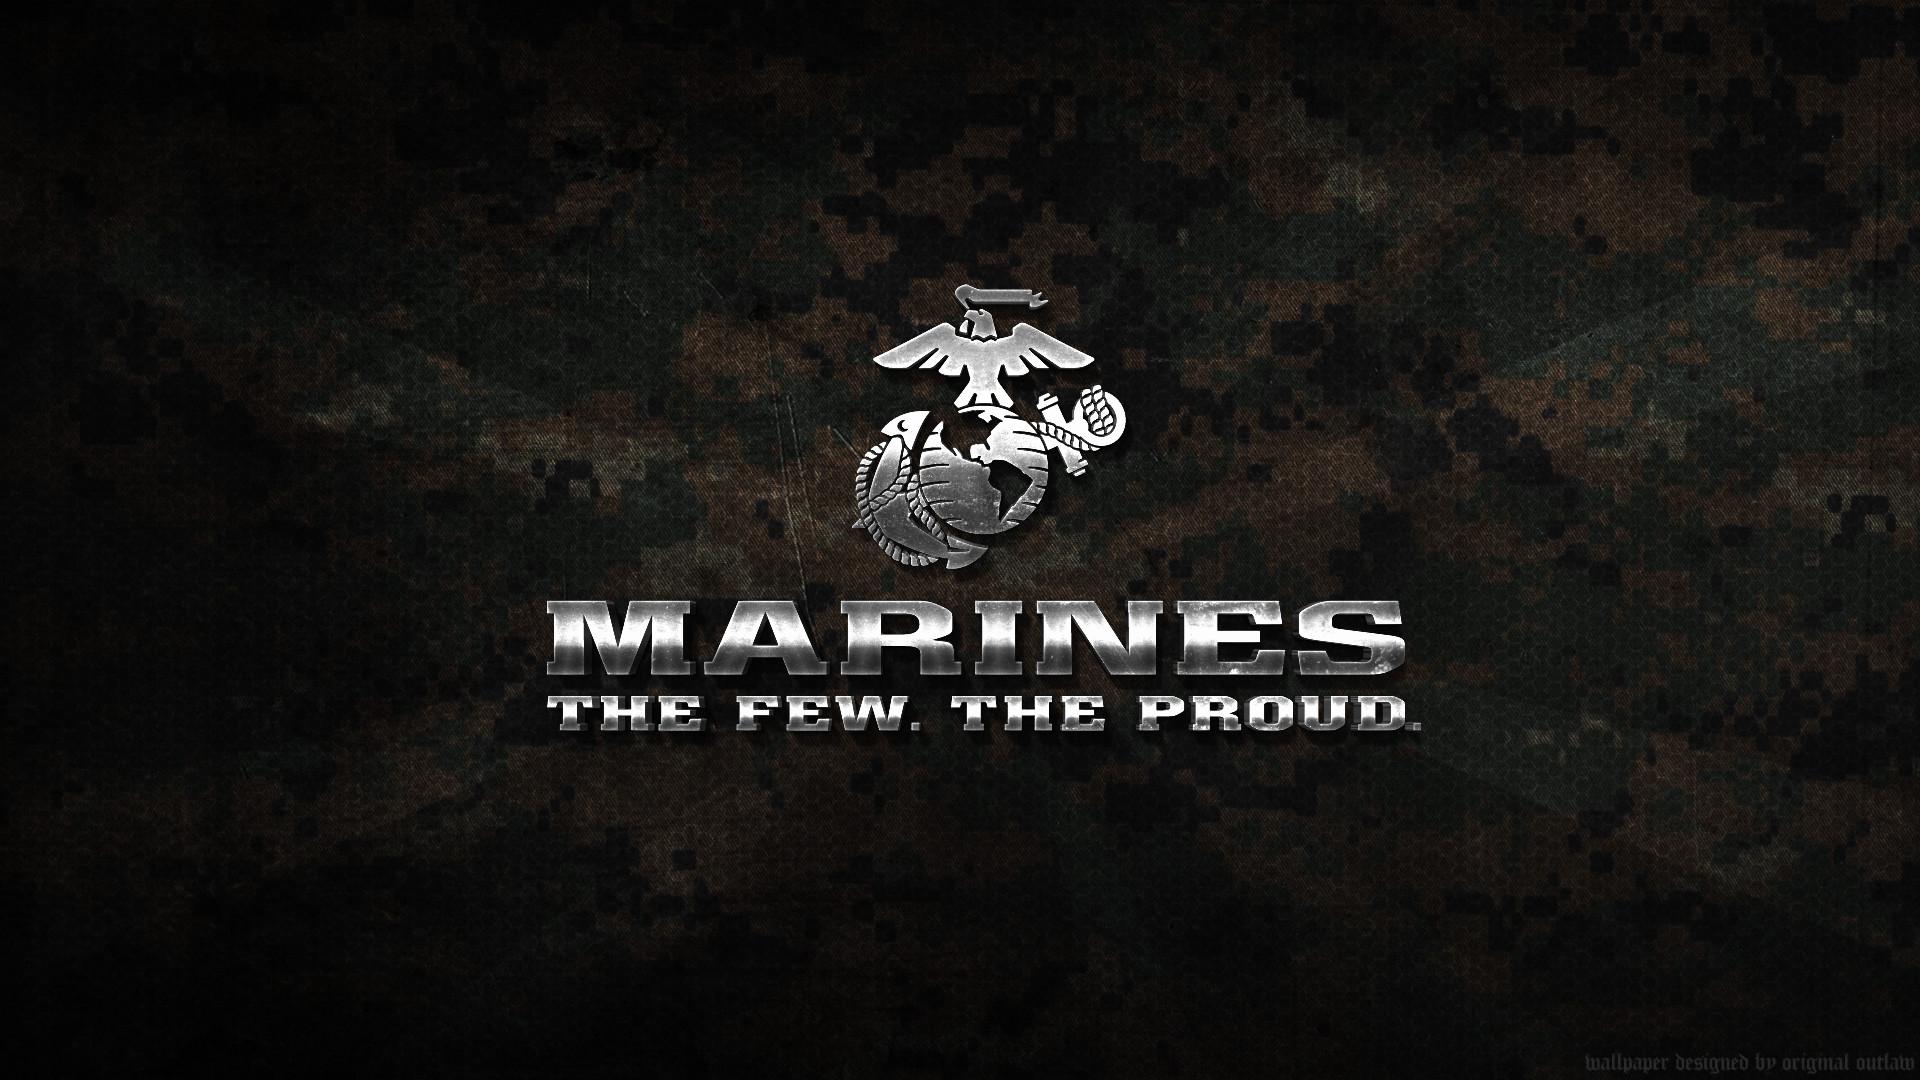 Res: 1920x1080, United States Marine Corps